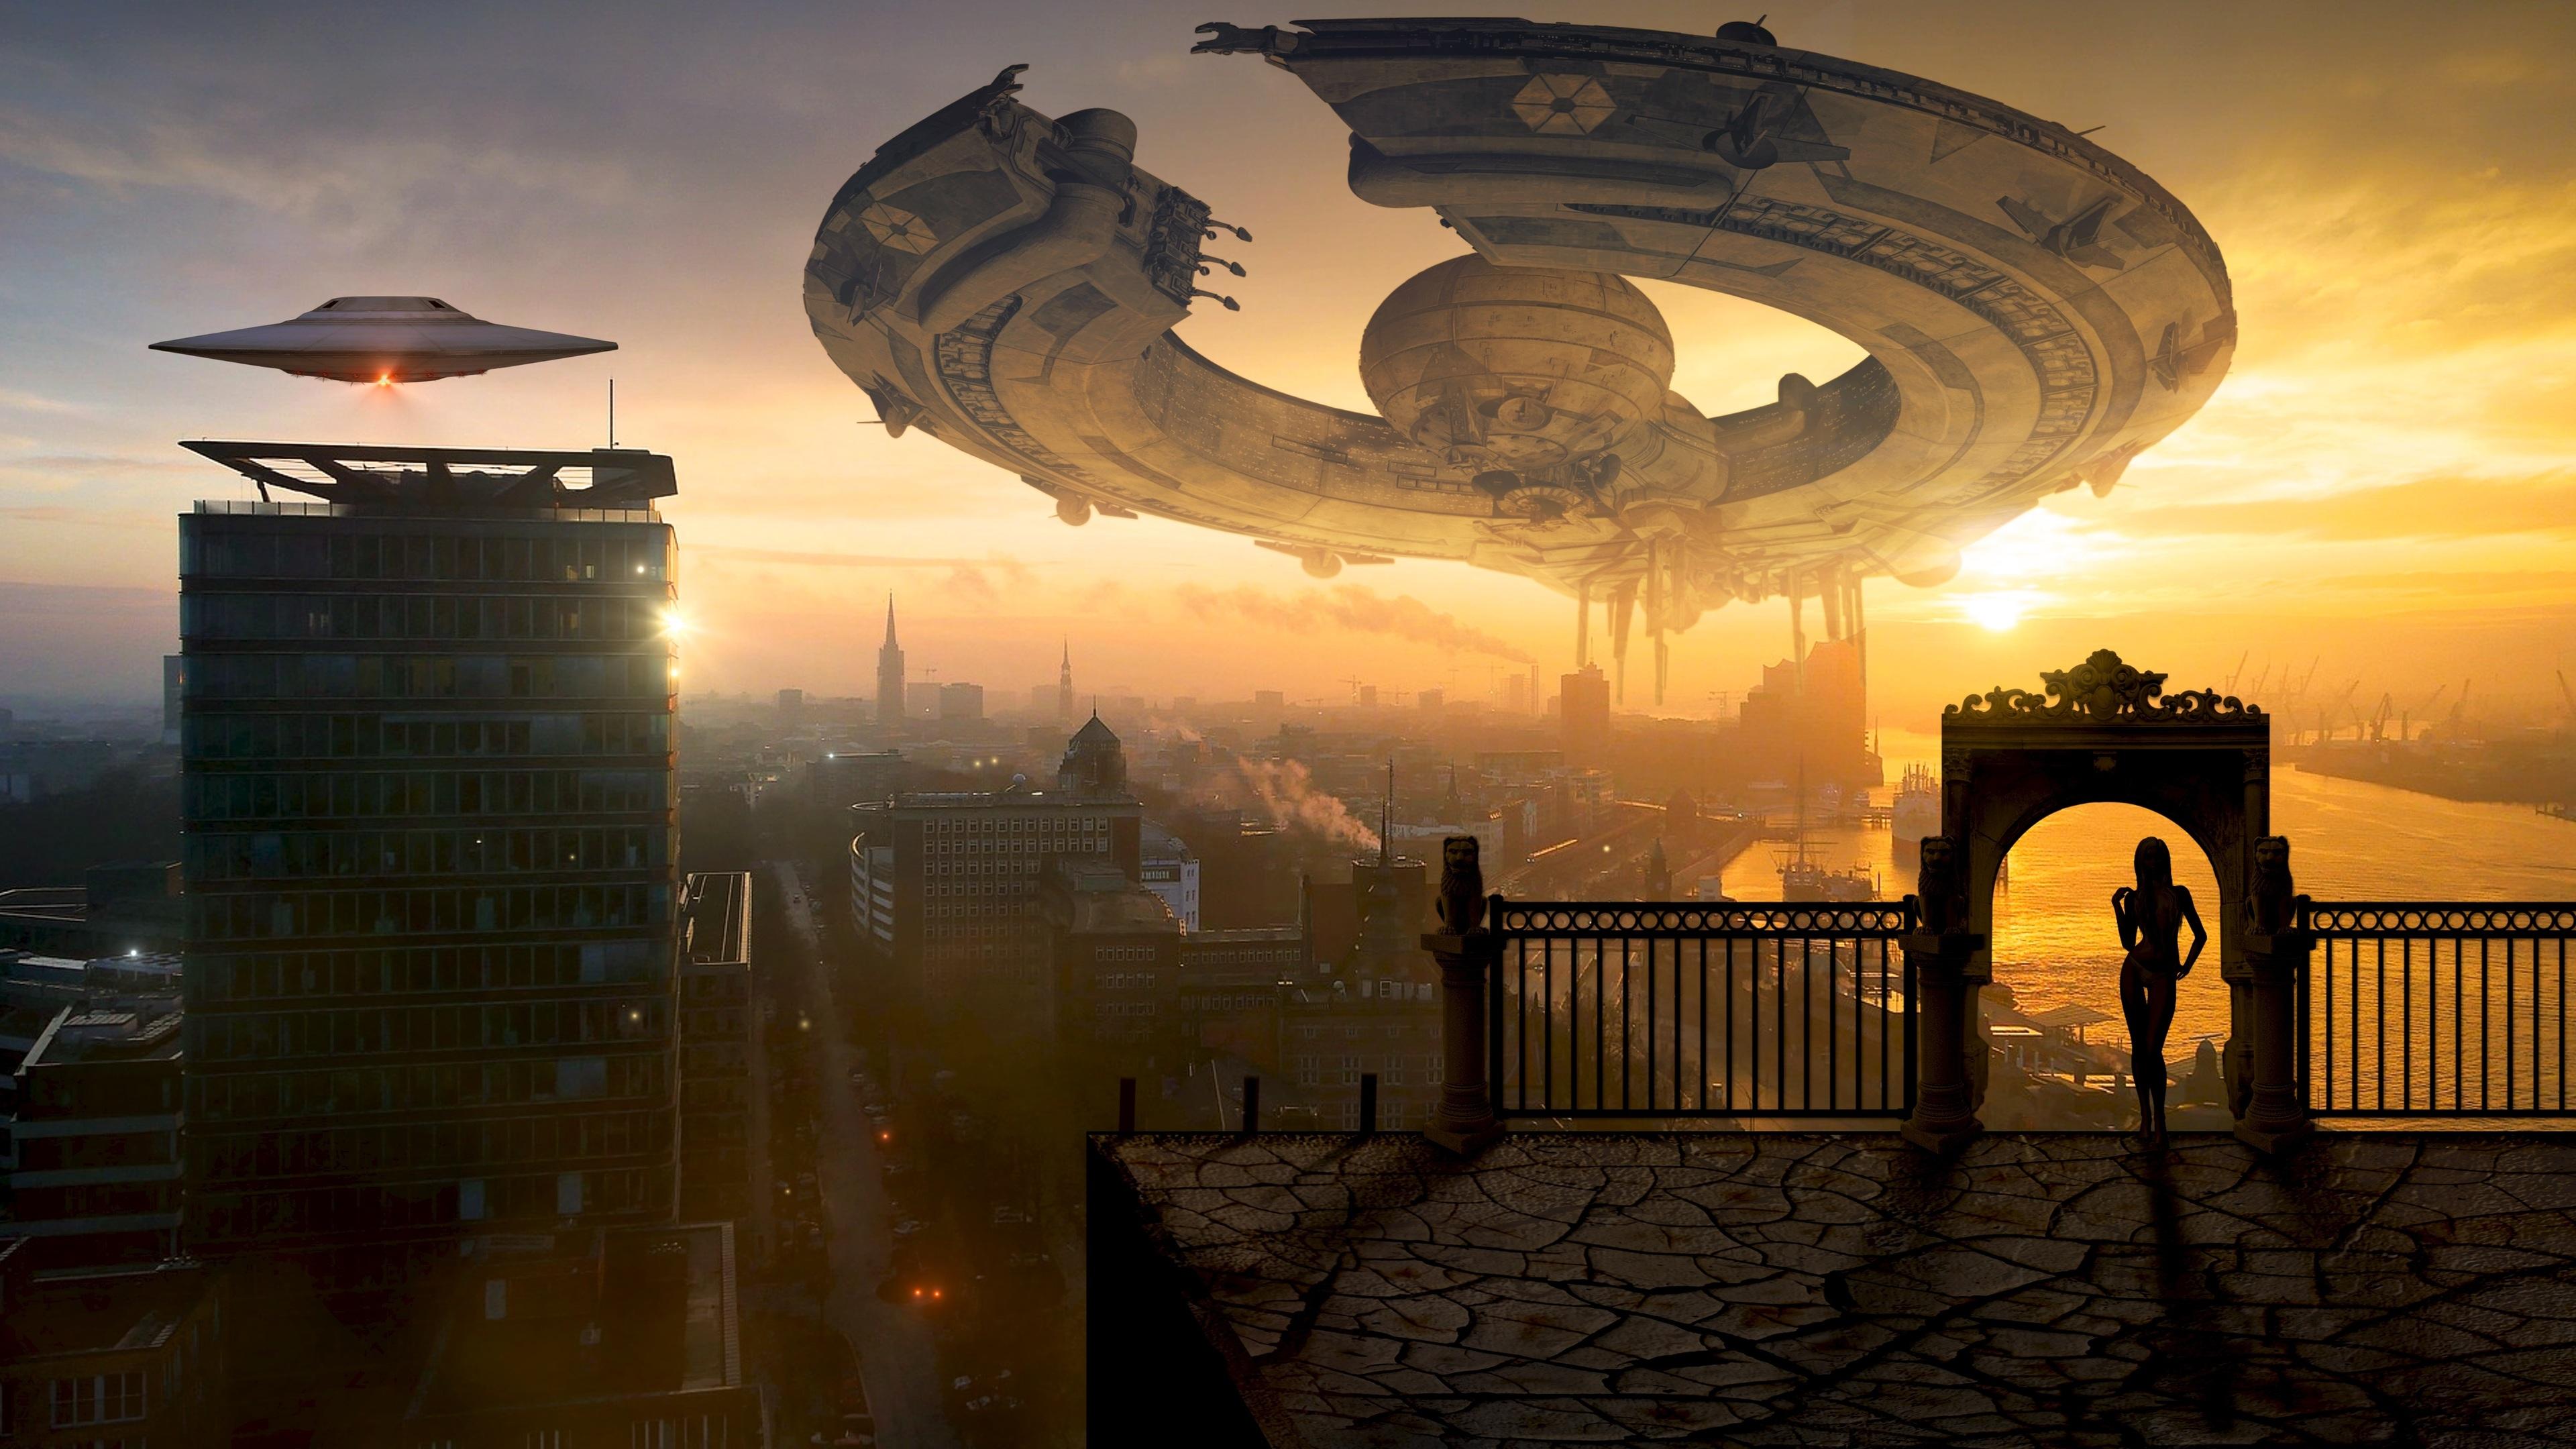 space ship fantasy scifi world 4k 1540750237 - Space Ship Fantasy Scifi World 4k - world wallpapers, spaceship wallpapers, scifi wallpapers, hd-wallpapers, fantasy wallpapers, digital art wallpapers, artwork wallpapers, artist wallpapers, 5k wallpapers, 4k-wallpapers